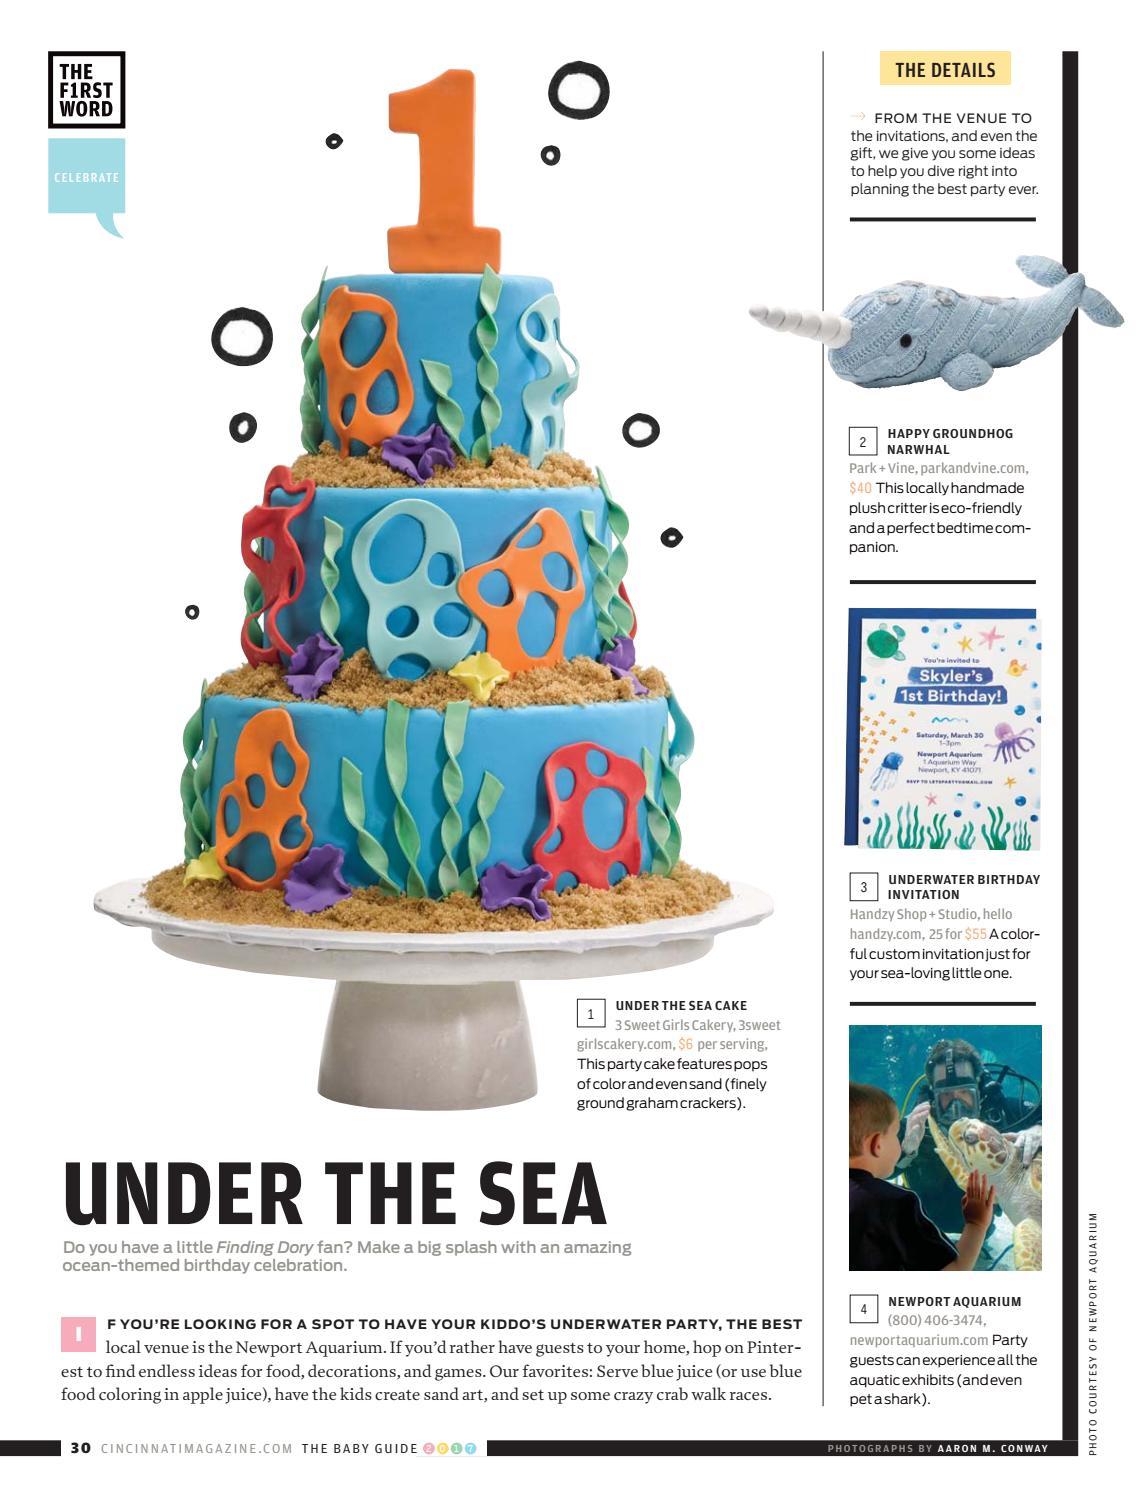 Cincinnati Baby Guide 2016 2017 By Magazine